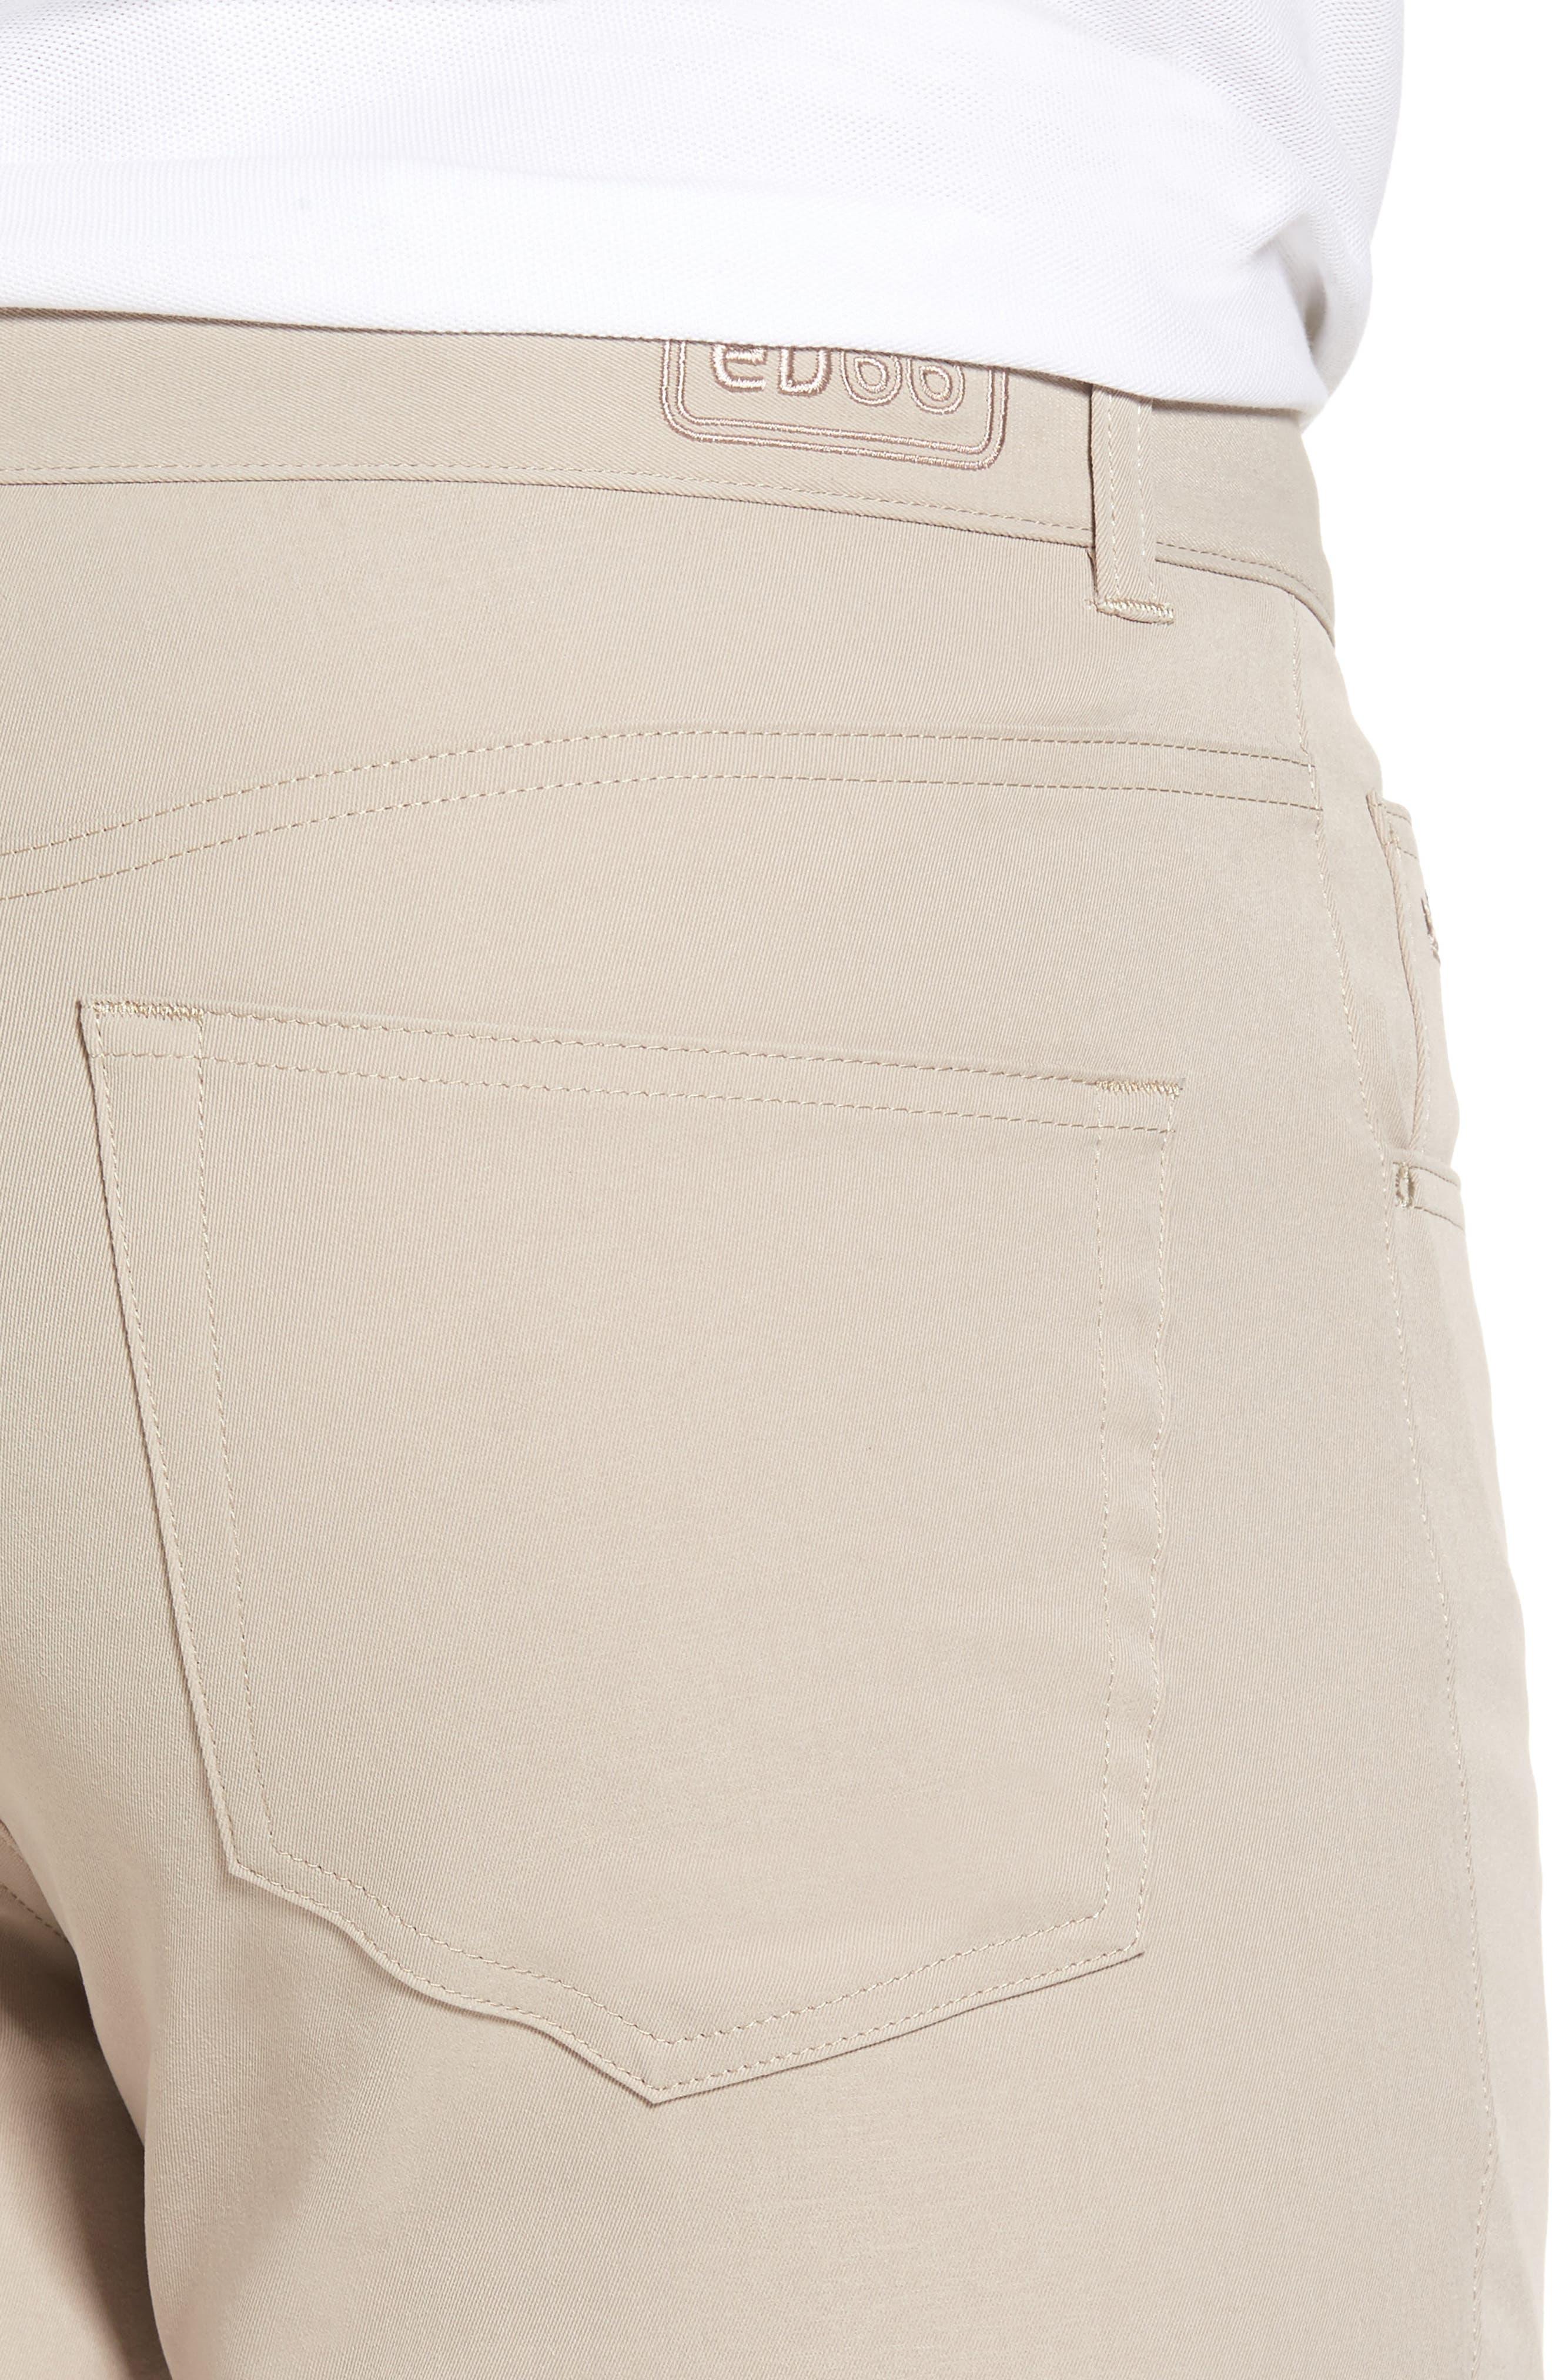 EB66 Performance Six-Pocket Pants,                             Alternate thumbnail 21, color,